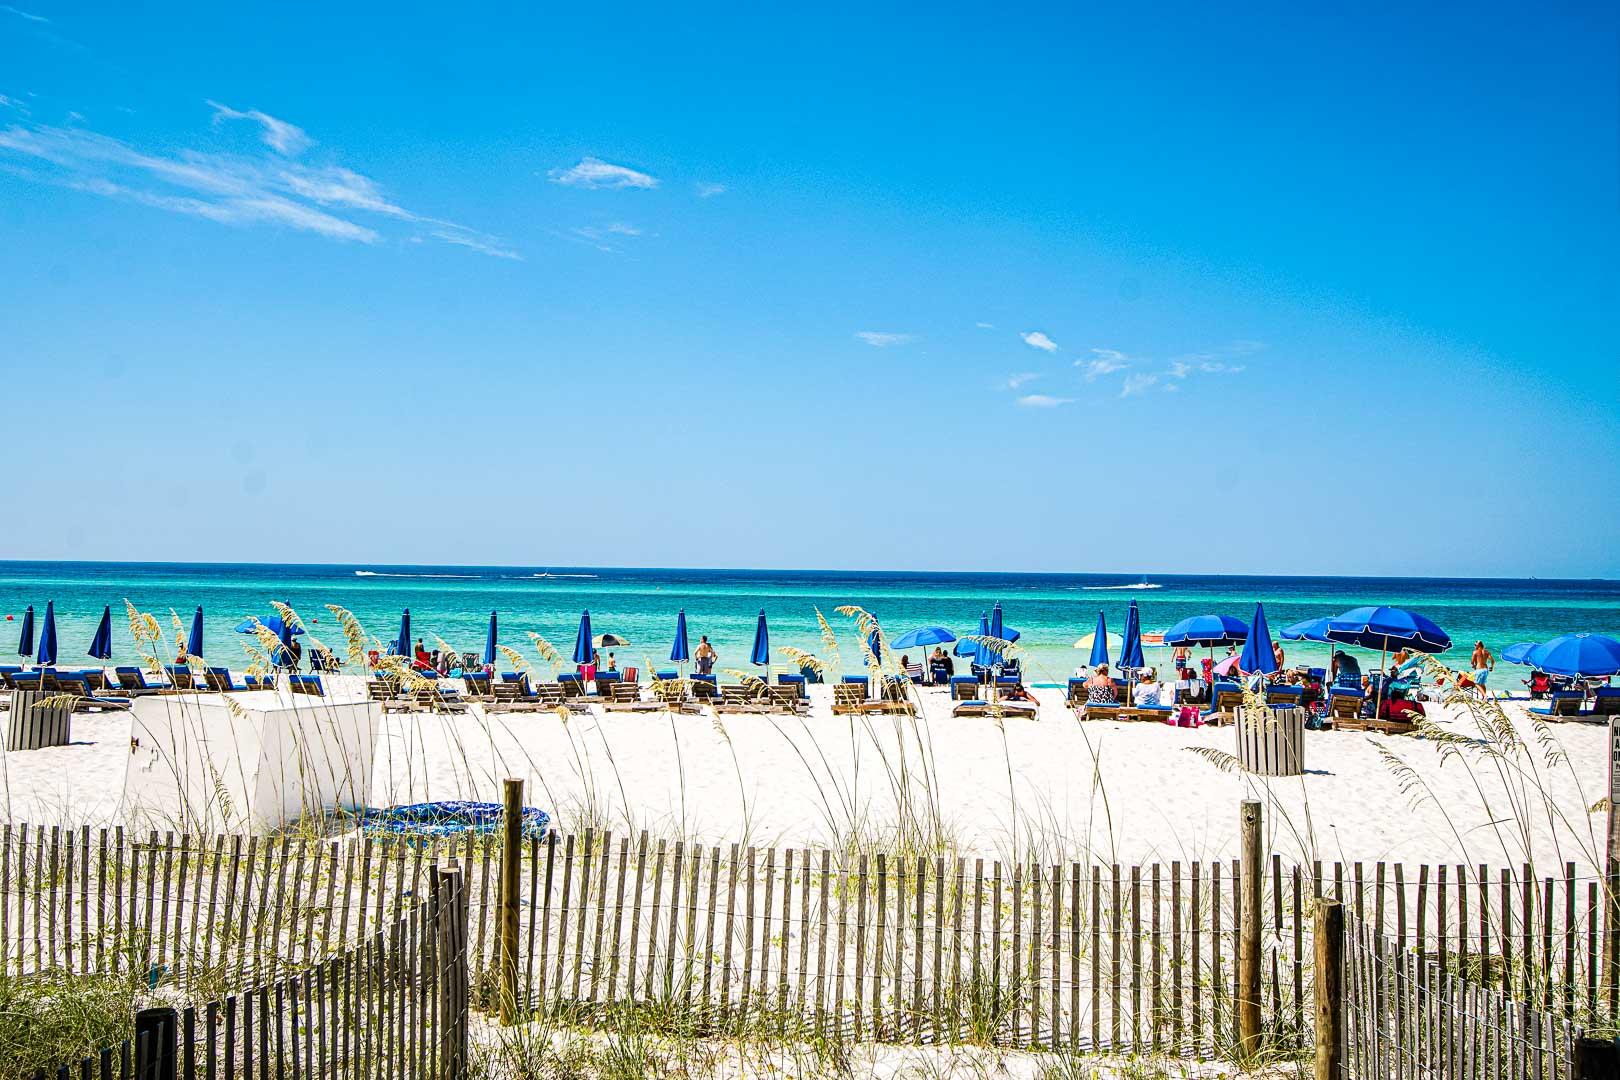 A scenic view of the beach from VRI's Landmark Holiday Beach Resort in Panama City, Florida.